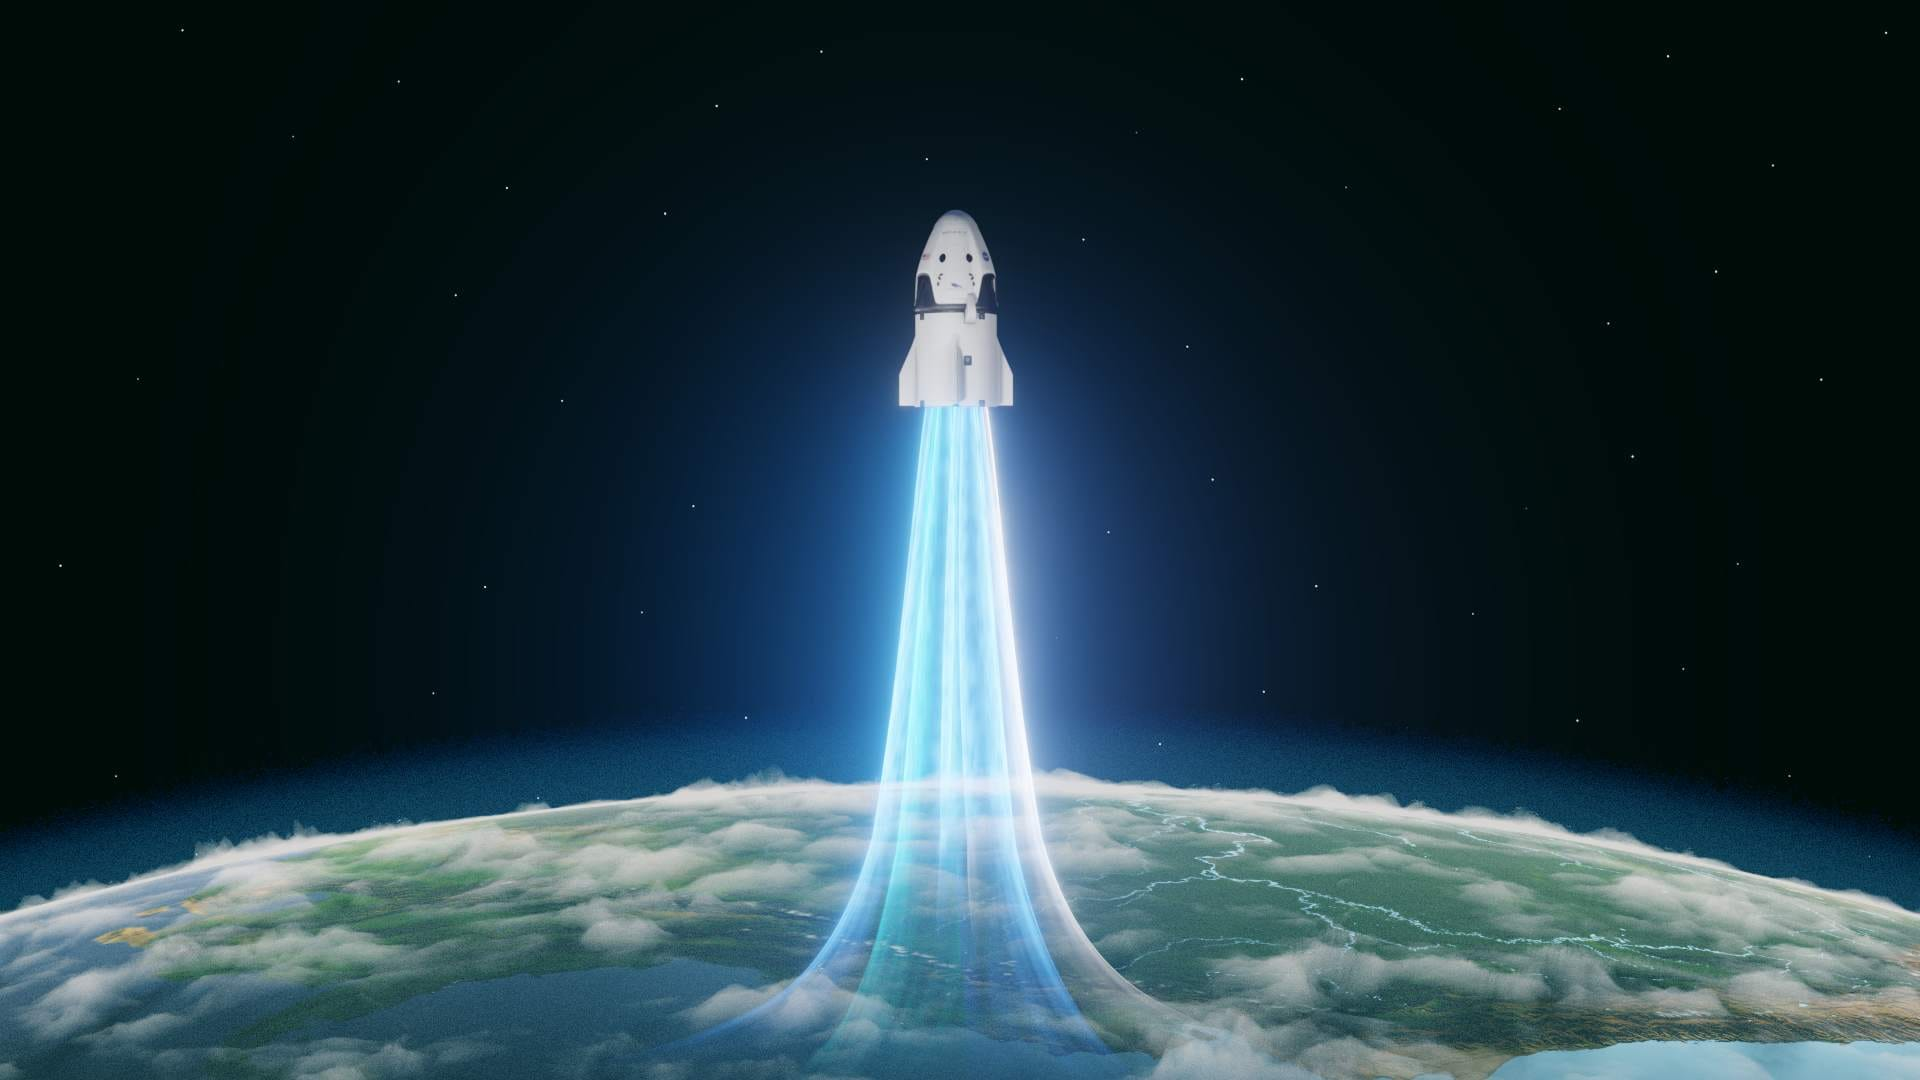 Inspiration4 all-civilian orbital mission